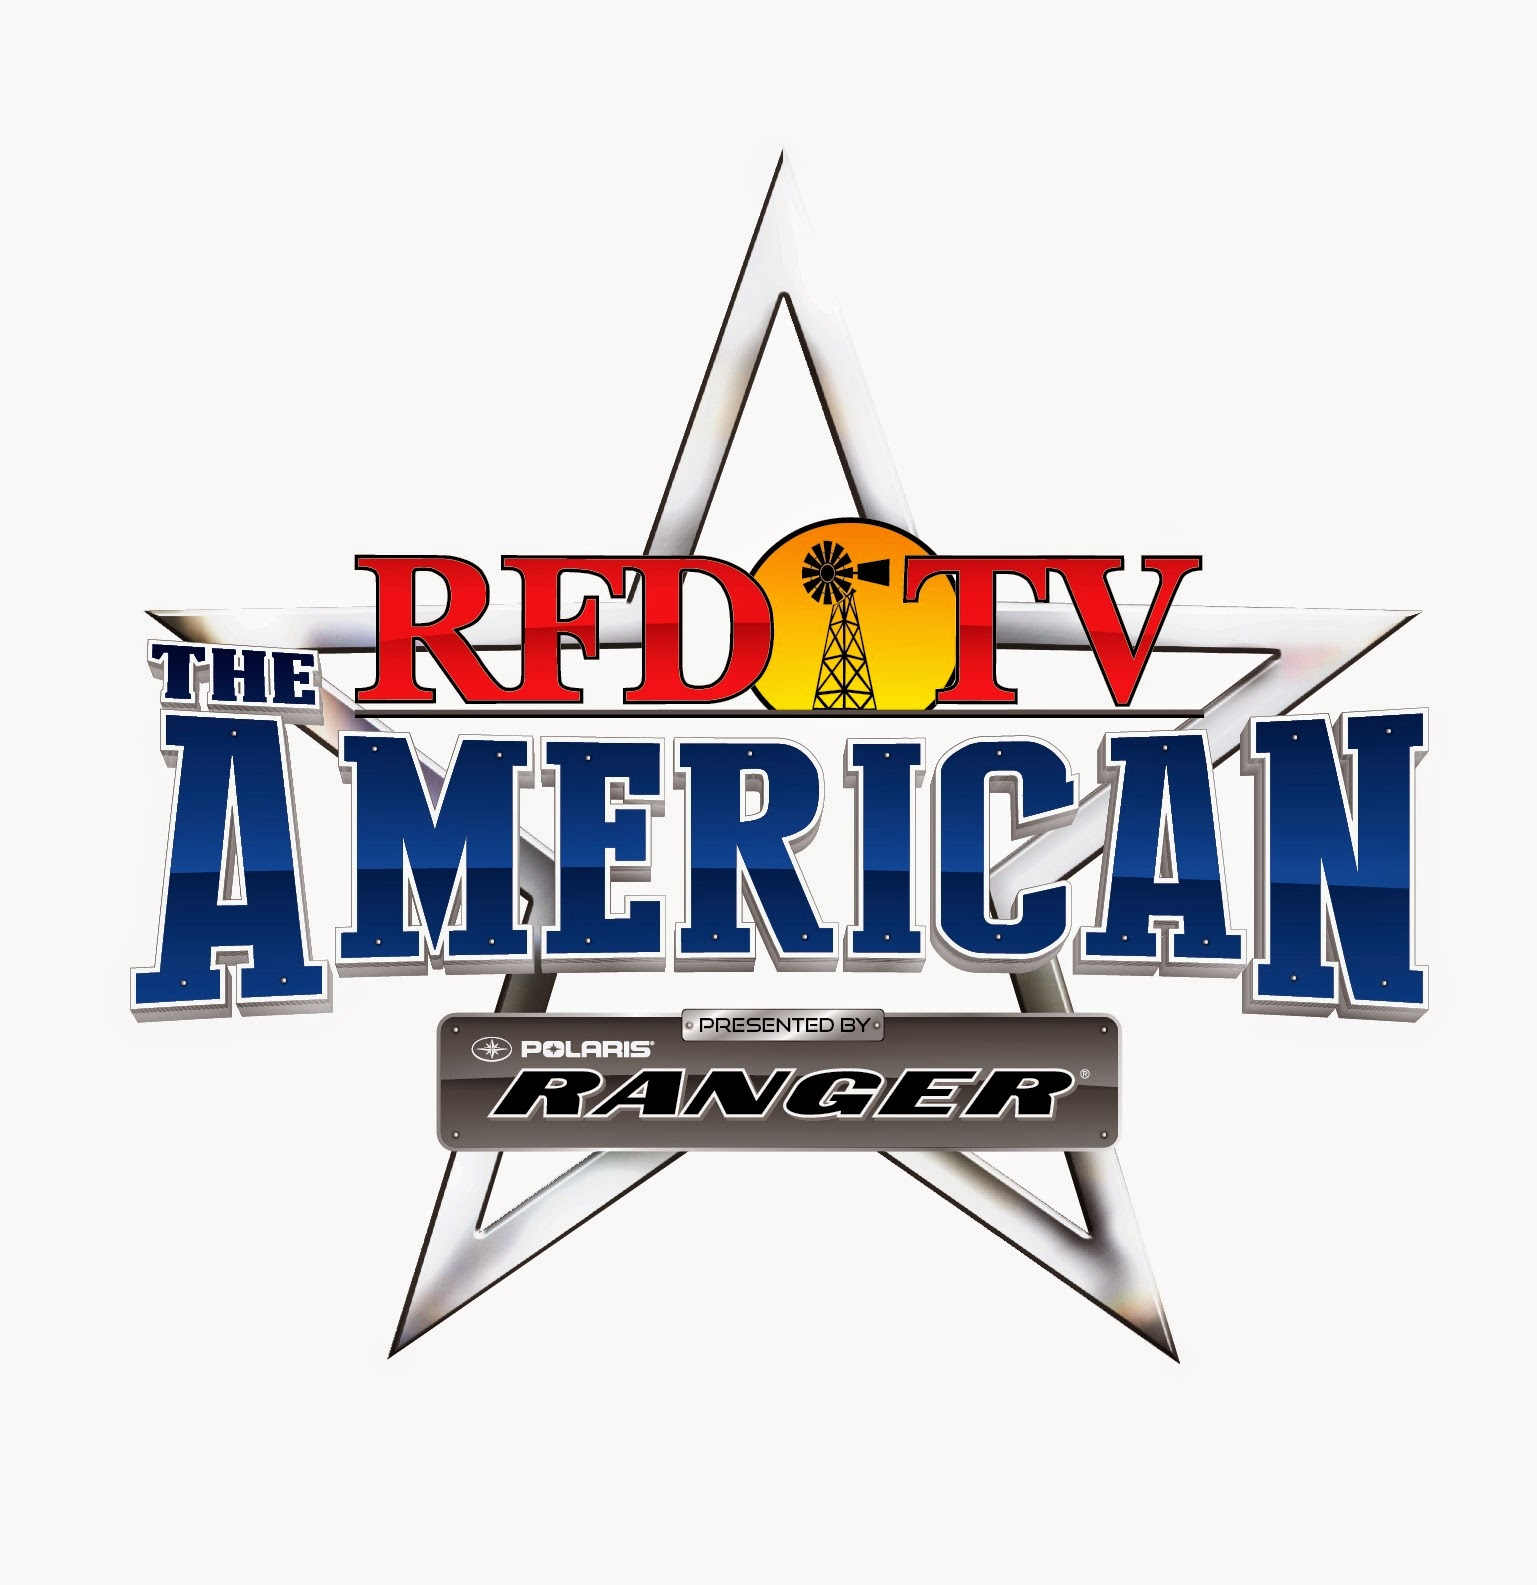 RFD-TV's THE AMERICAN